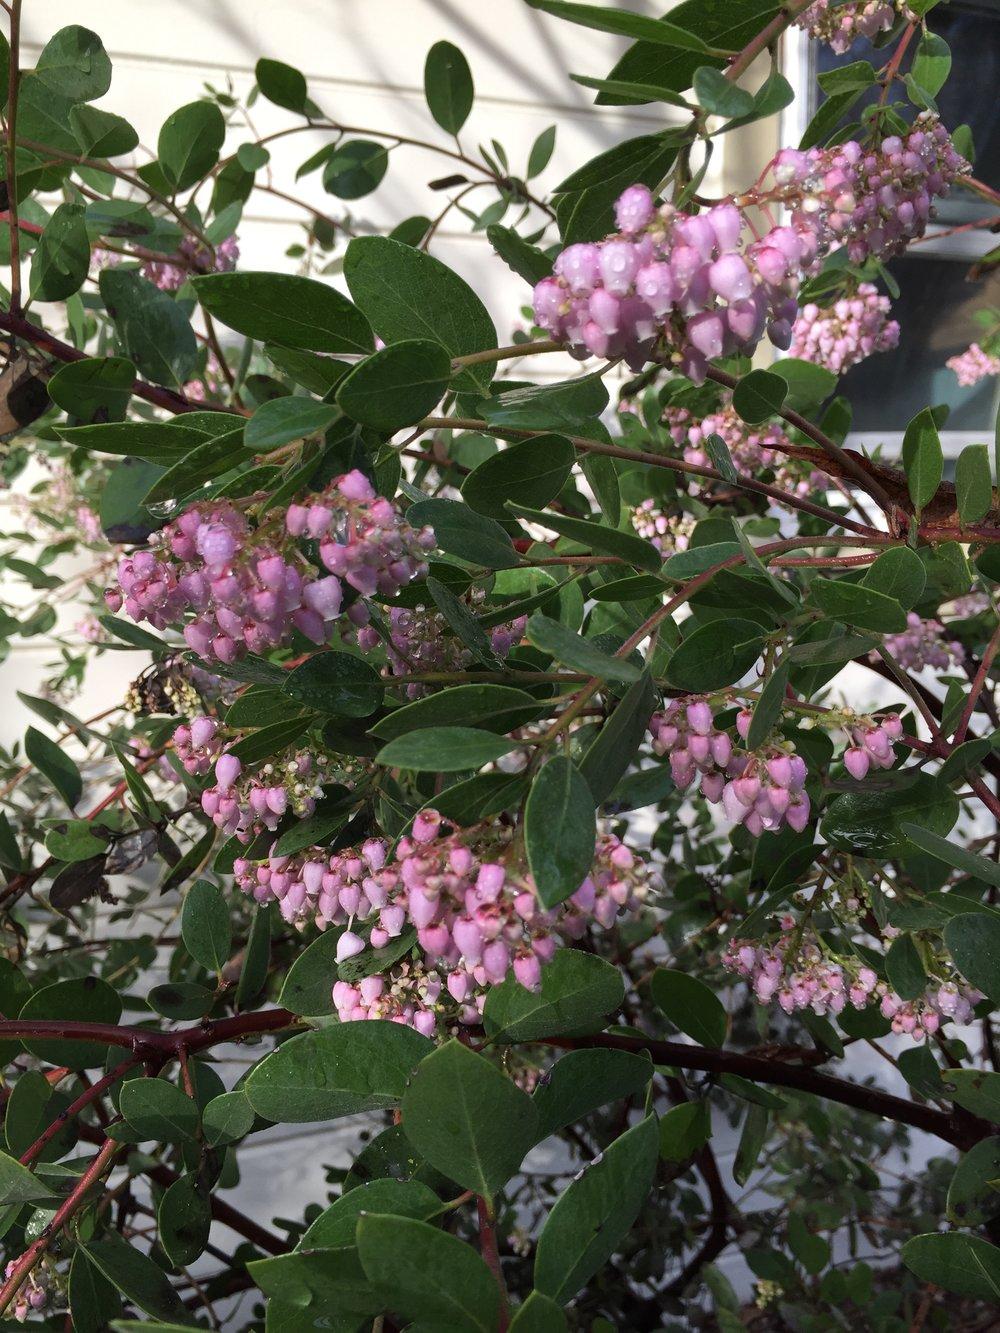 Arctostaphylos densiflora 'Howard McMinn' in my garden